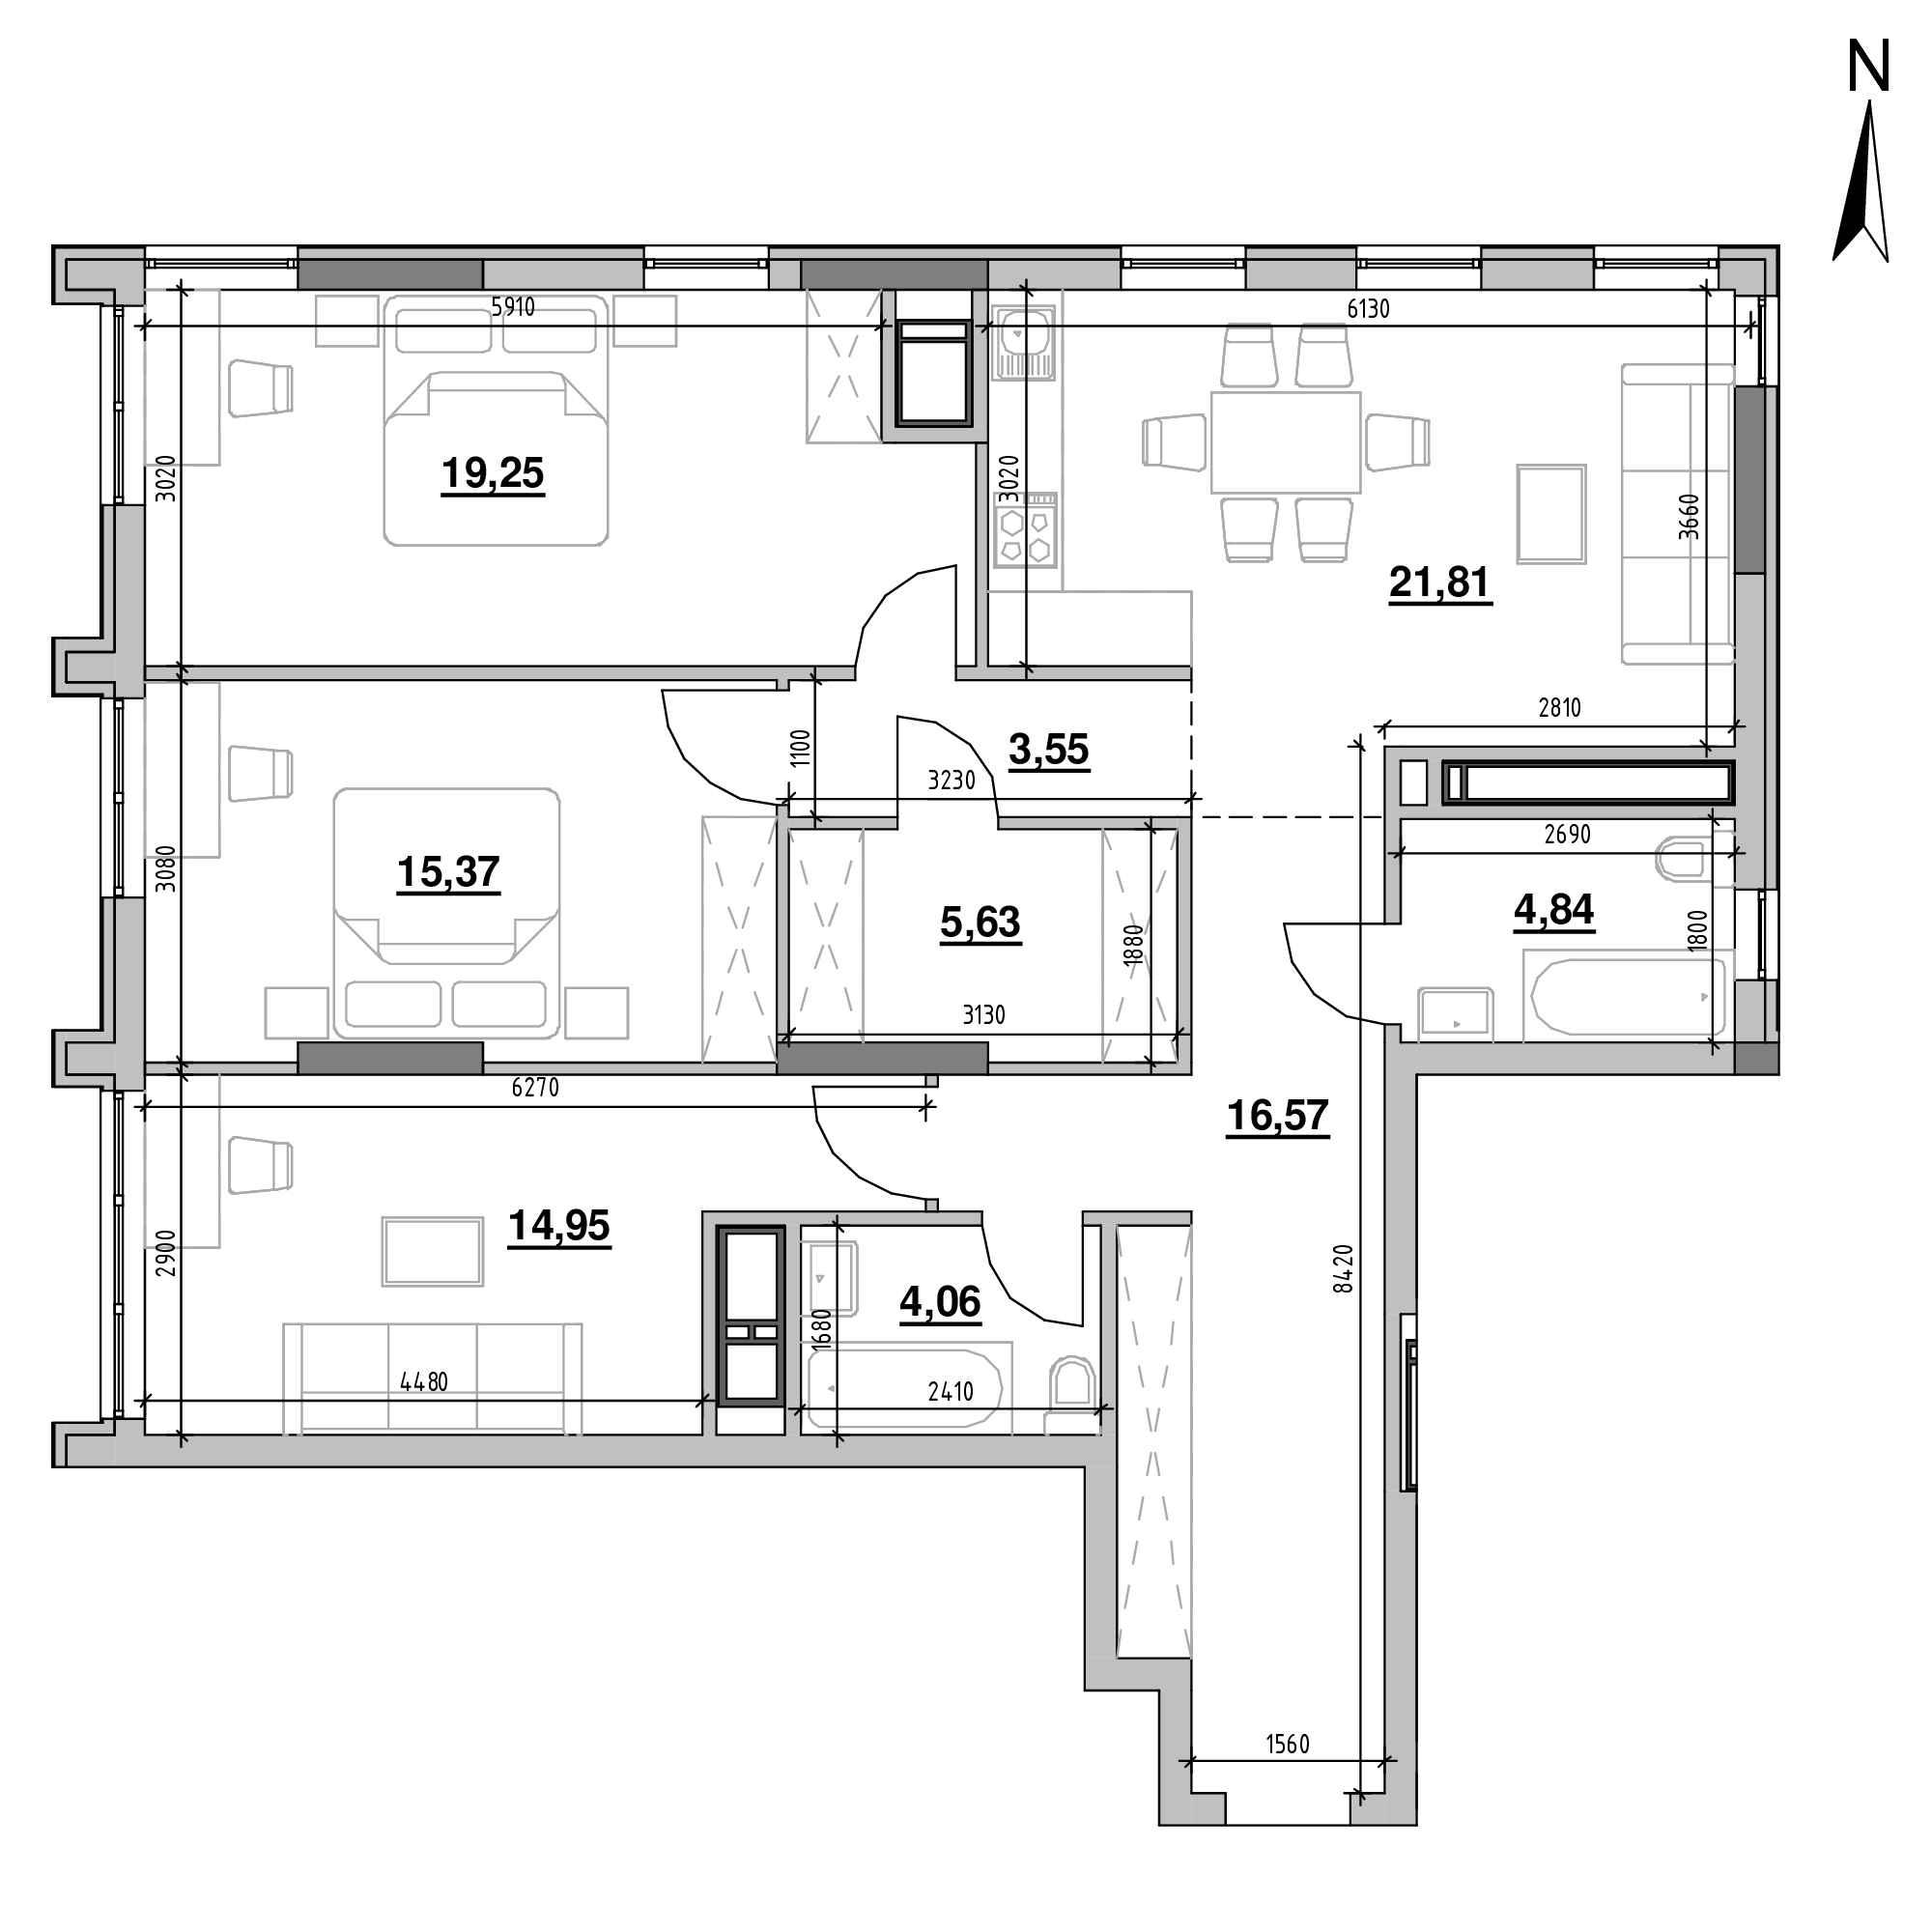 ЖК Nordica Residence: планування 1-кімнатної квартири, №196, 40.97 м<sup>2</sup>